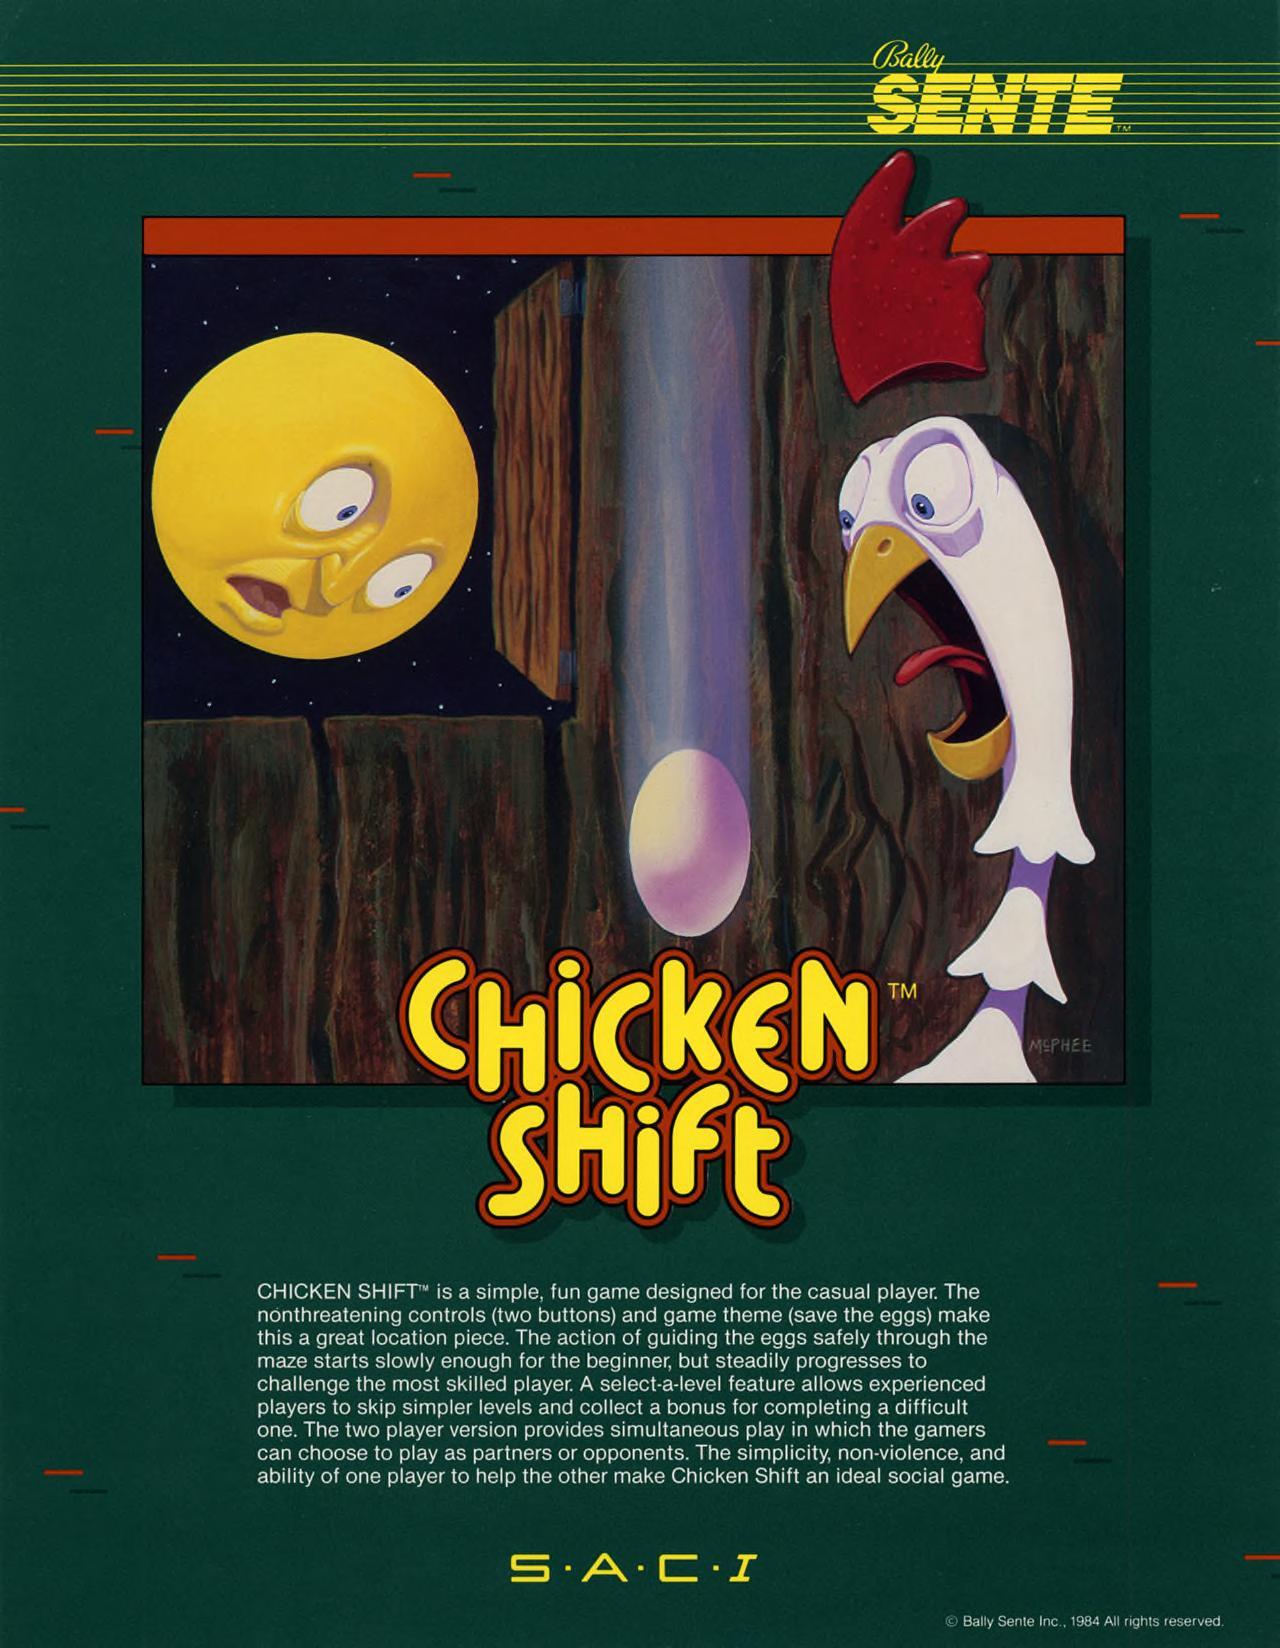 Chicken Shift, an arcade video game by Bally/Sente